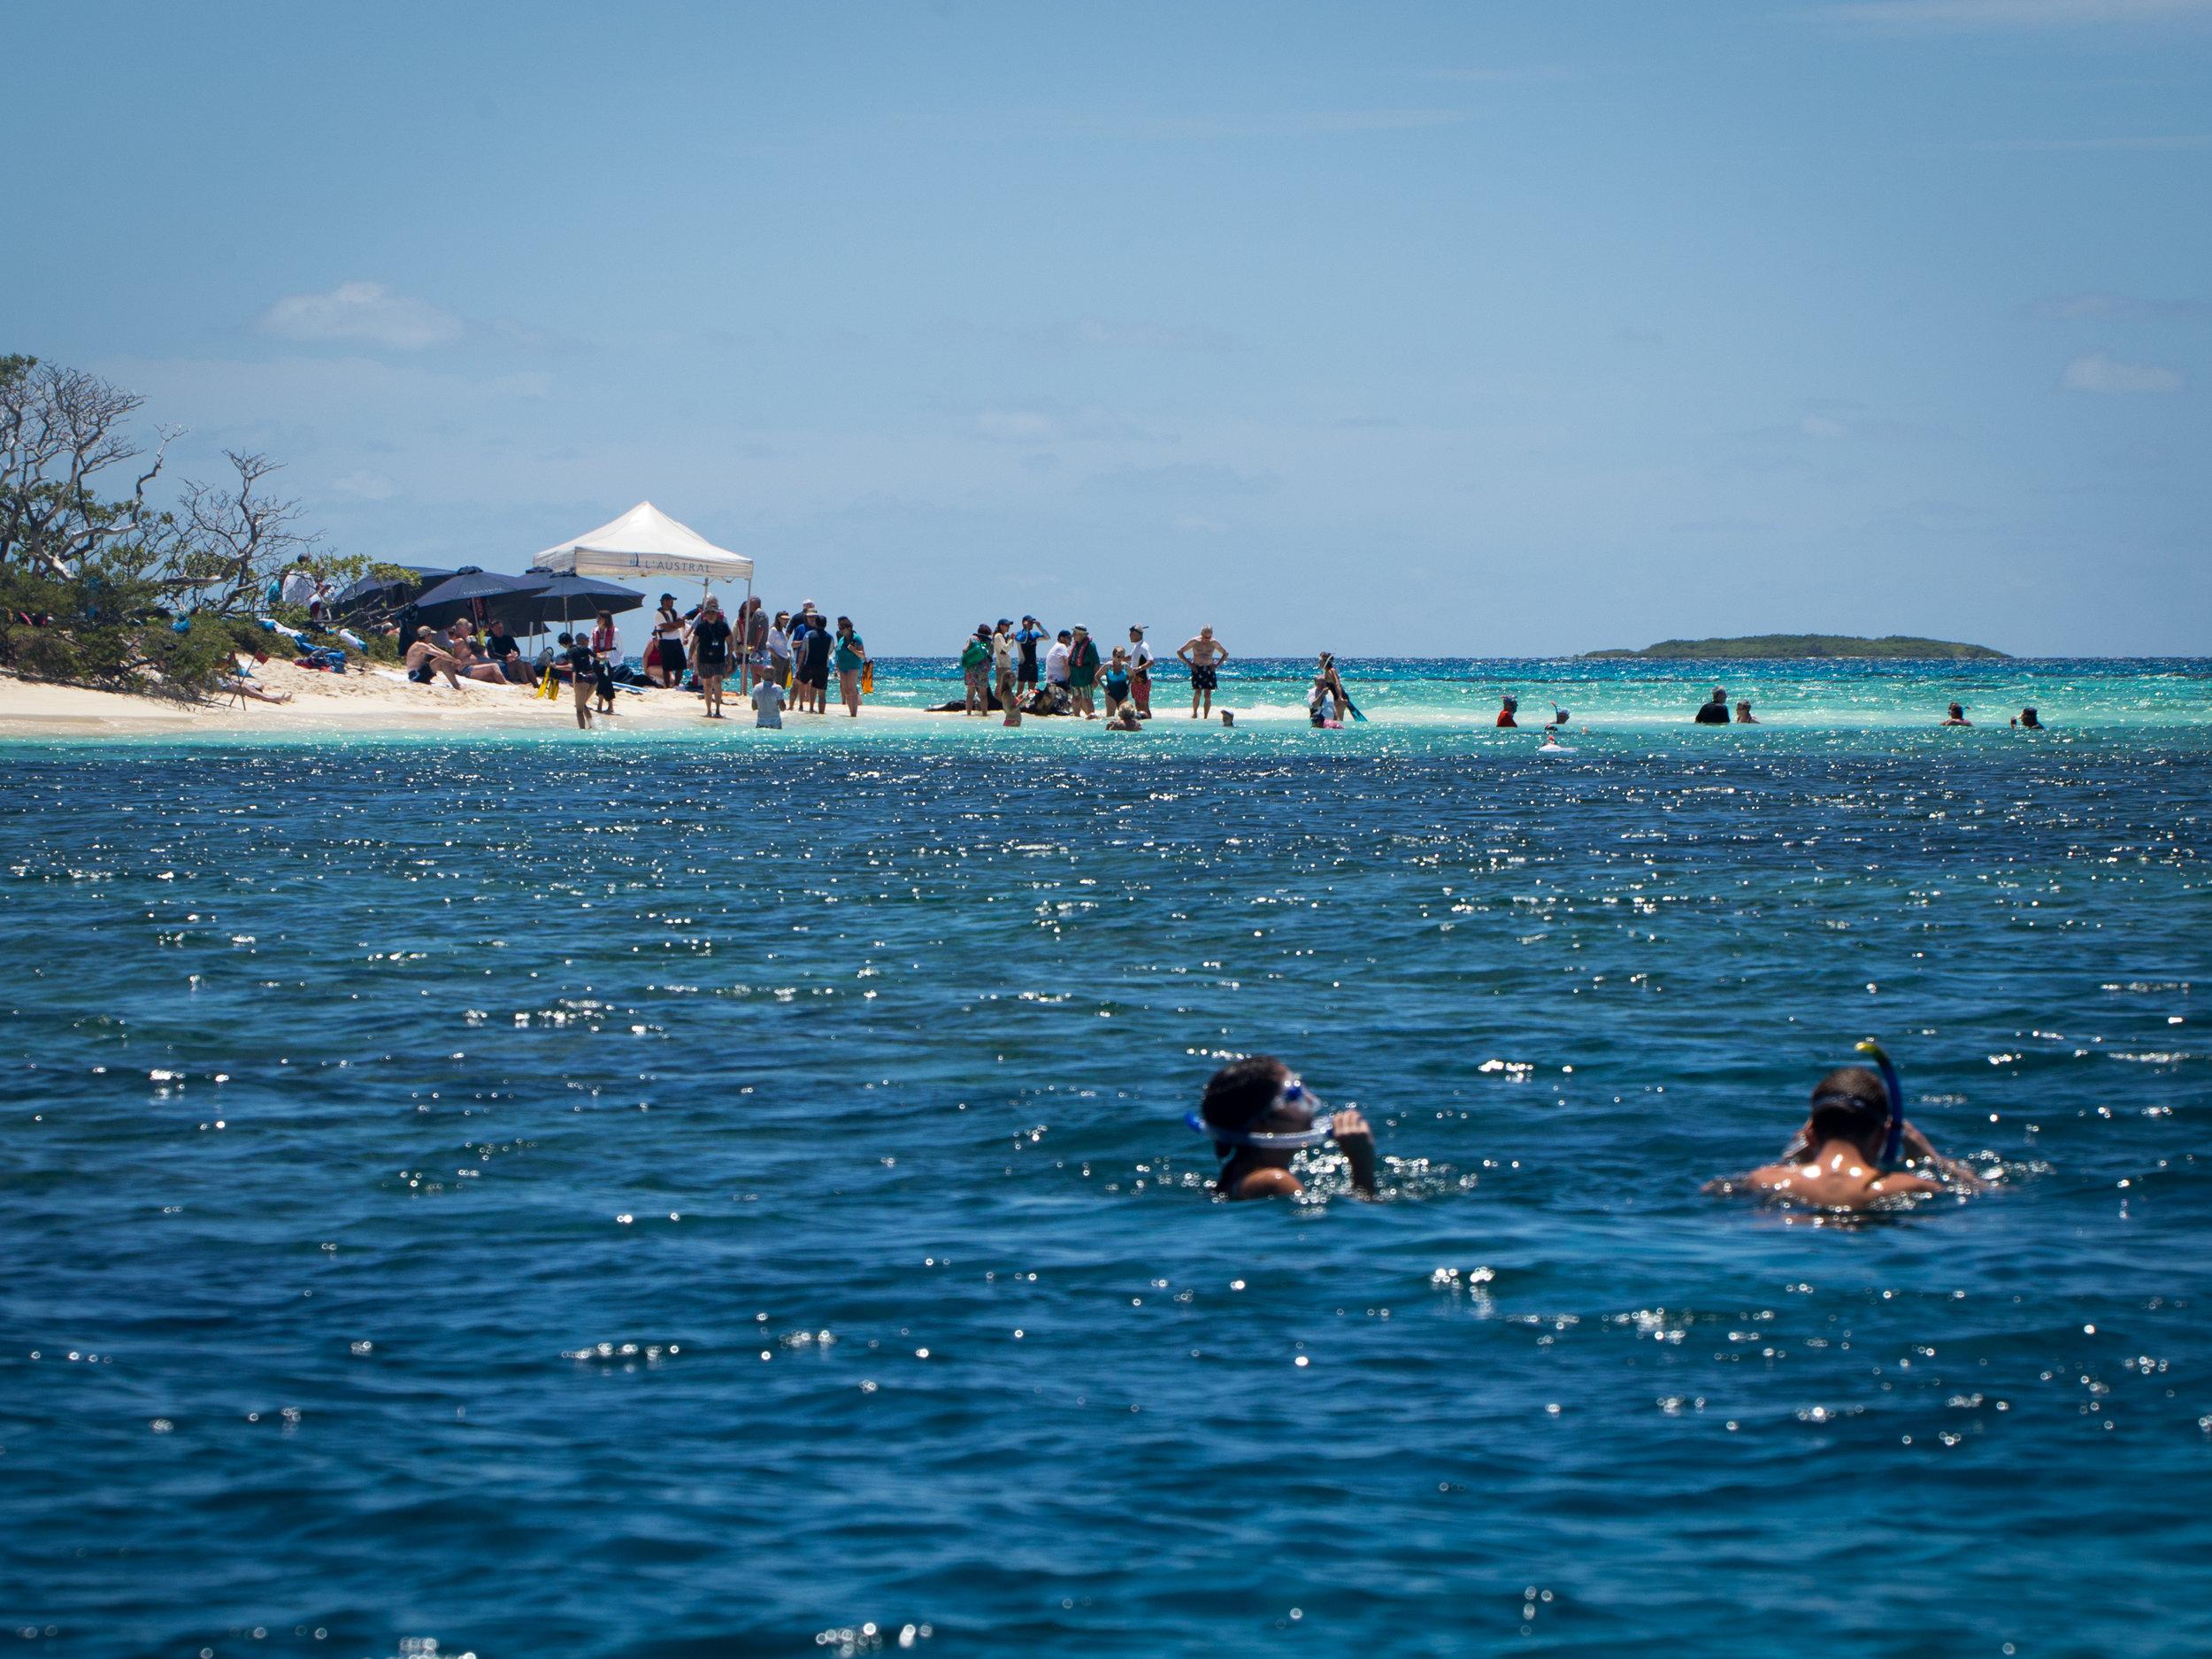 Kouare Island Snorkeling